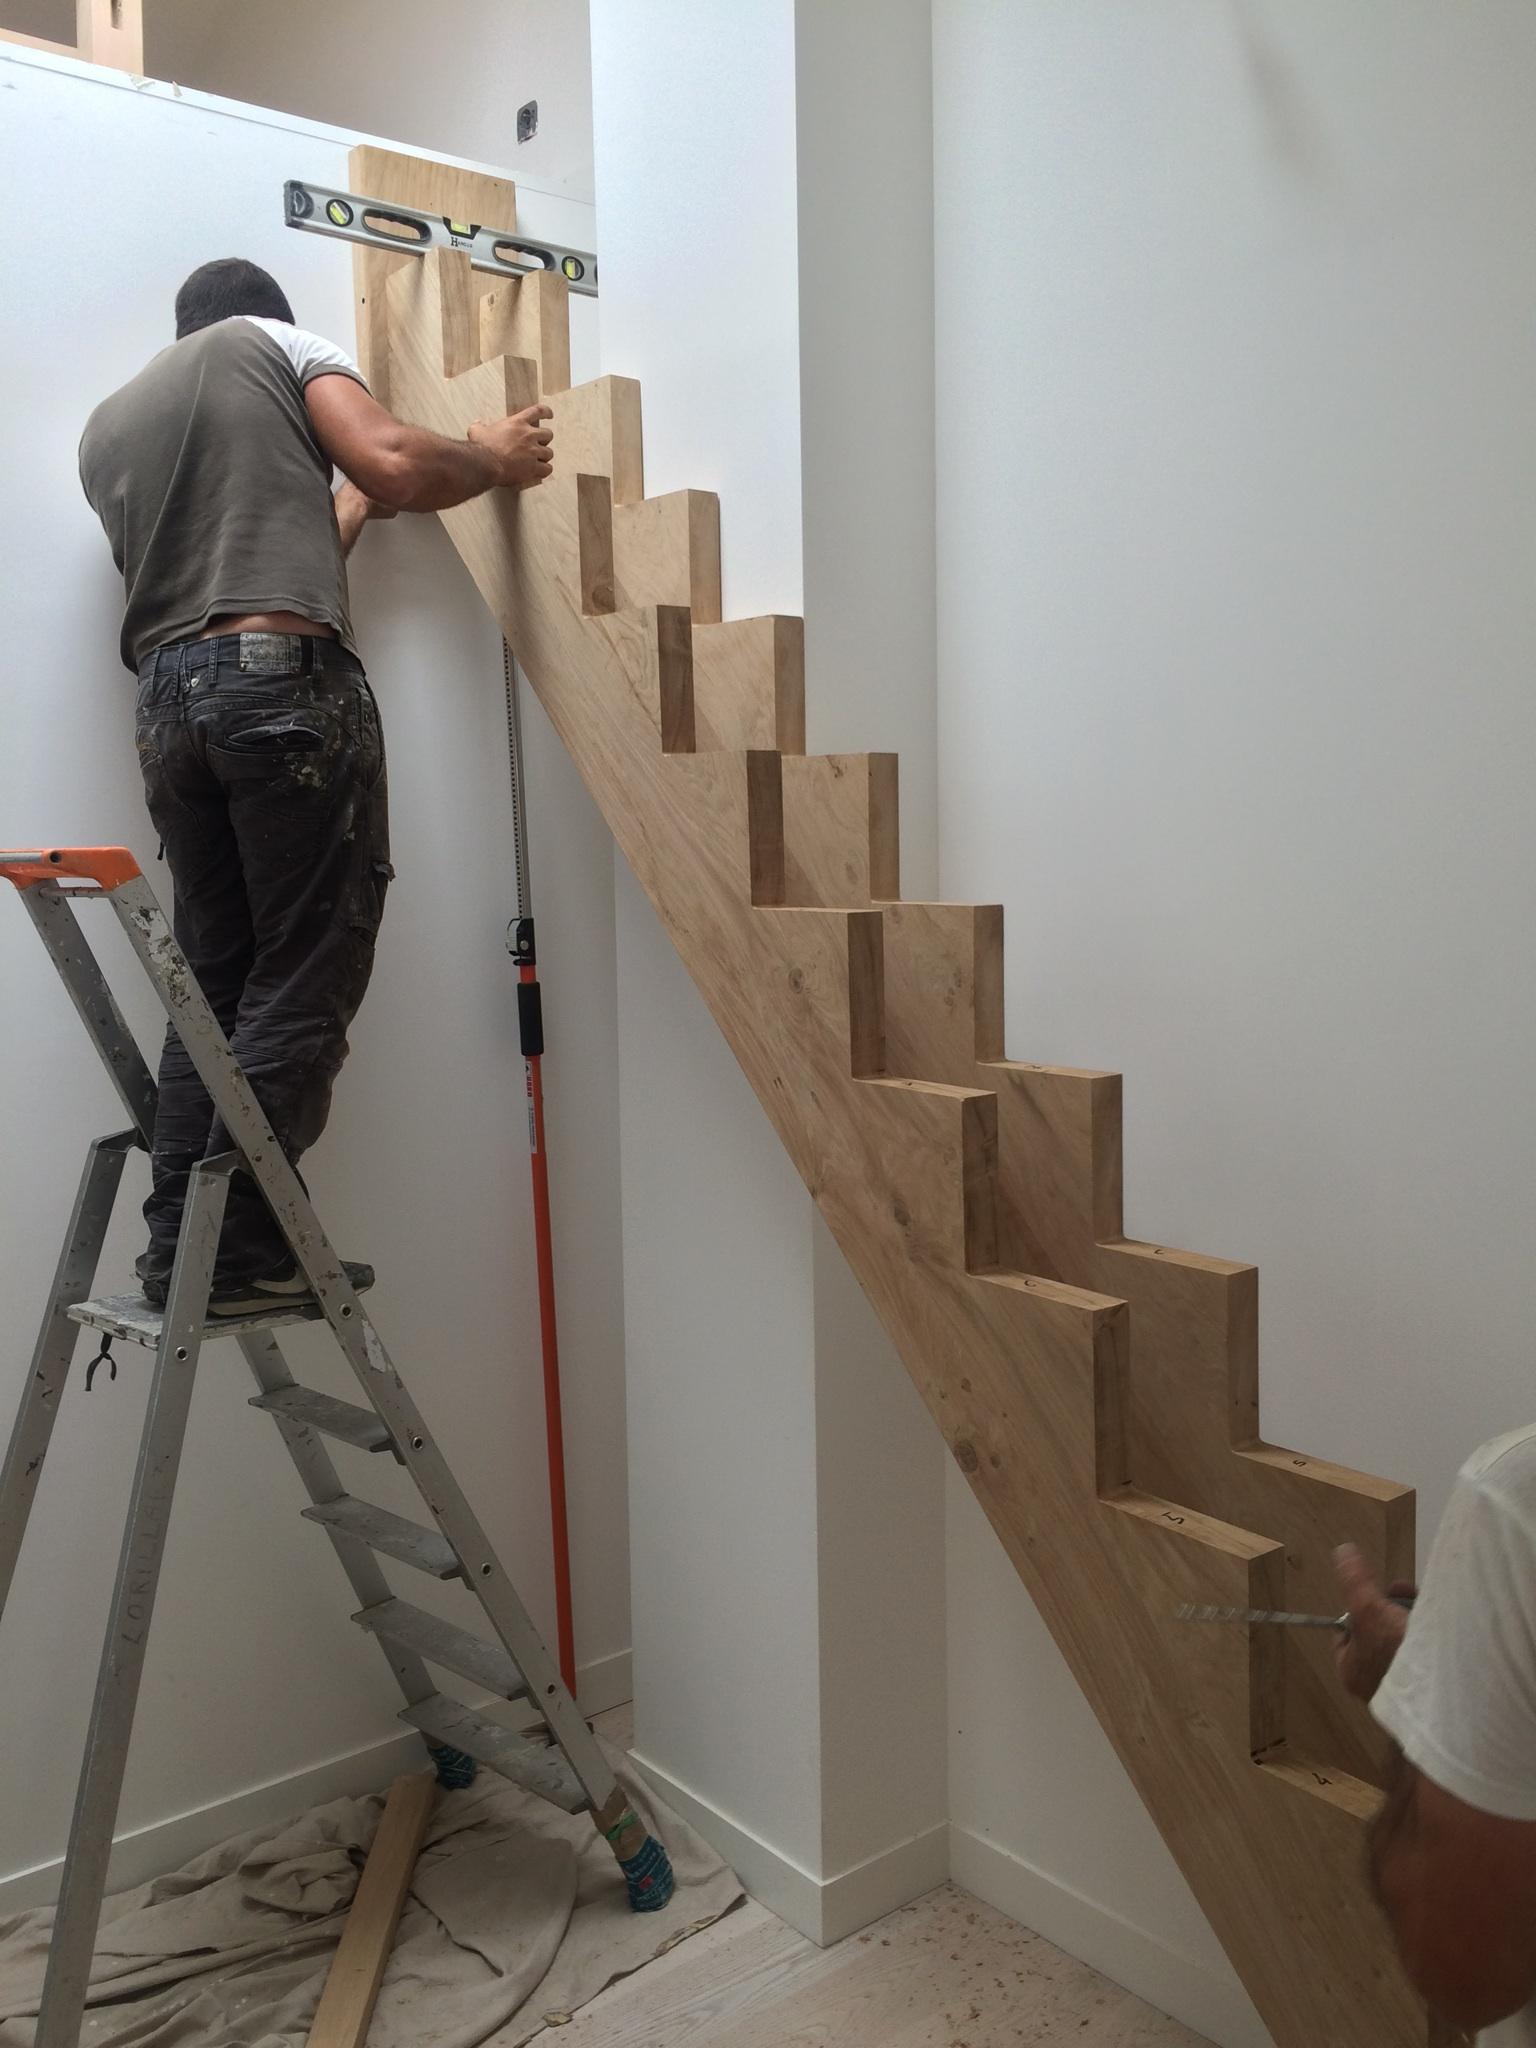 Fabricant D Escalier Bois escamodern, fabricant d'escalier » escalier bois à limon central